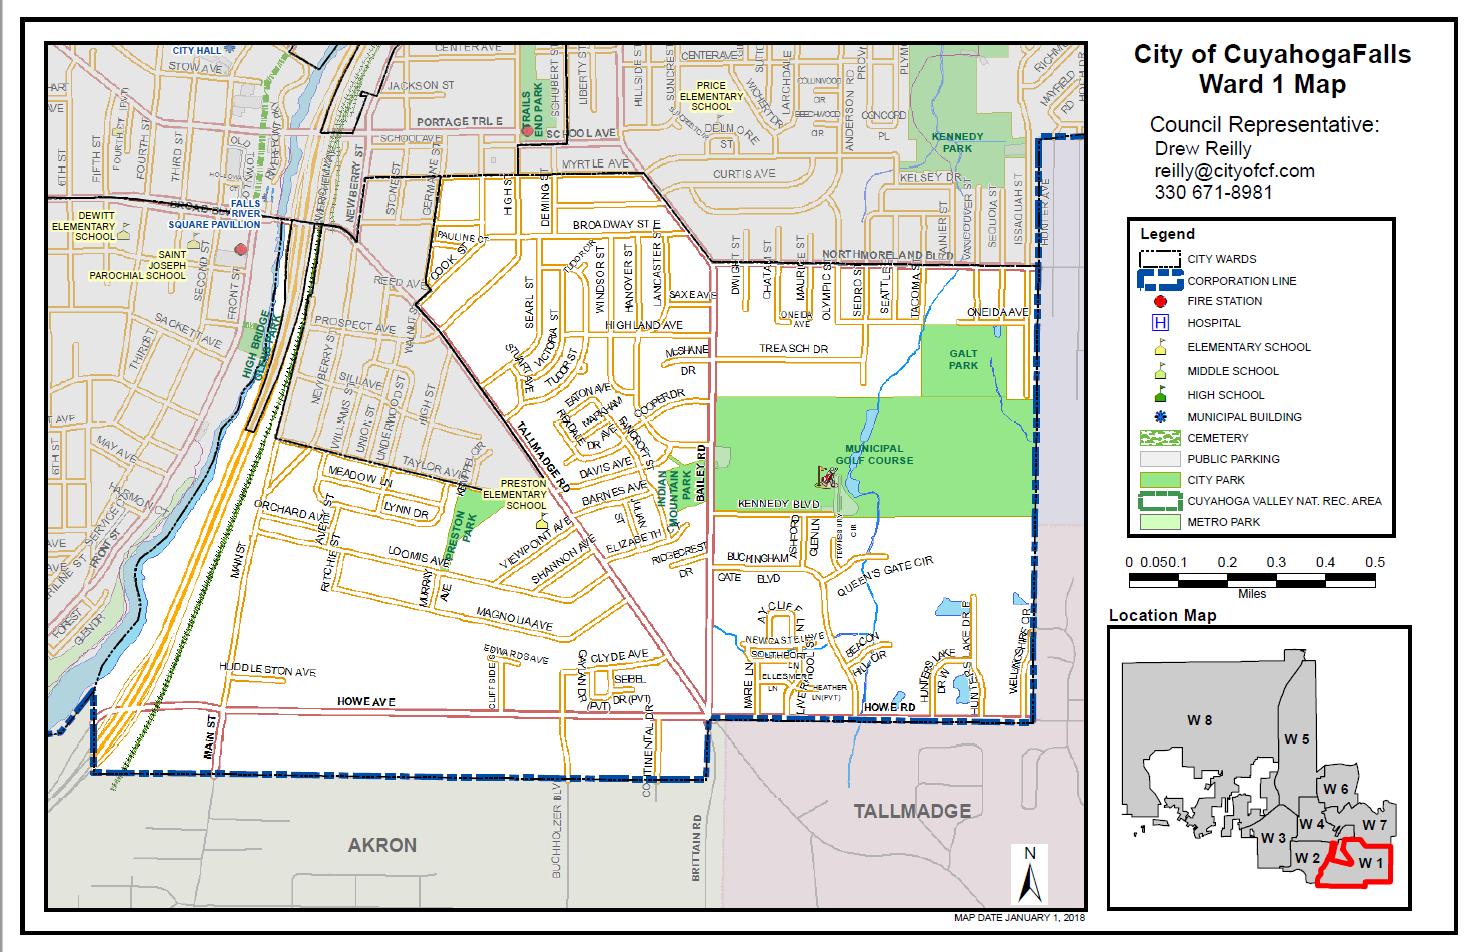 Ward One City of Cuyahoga Falls